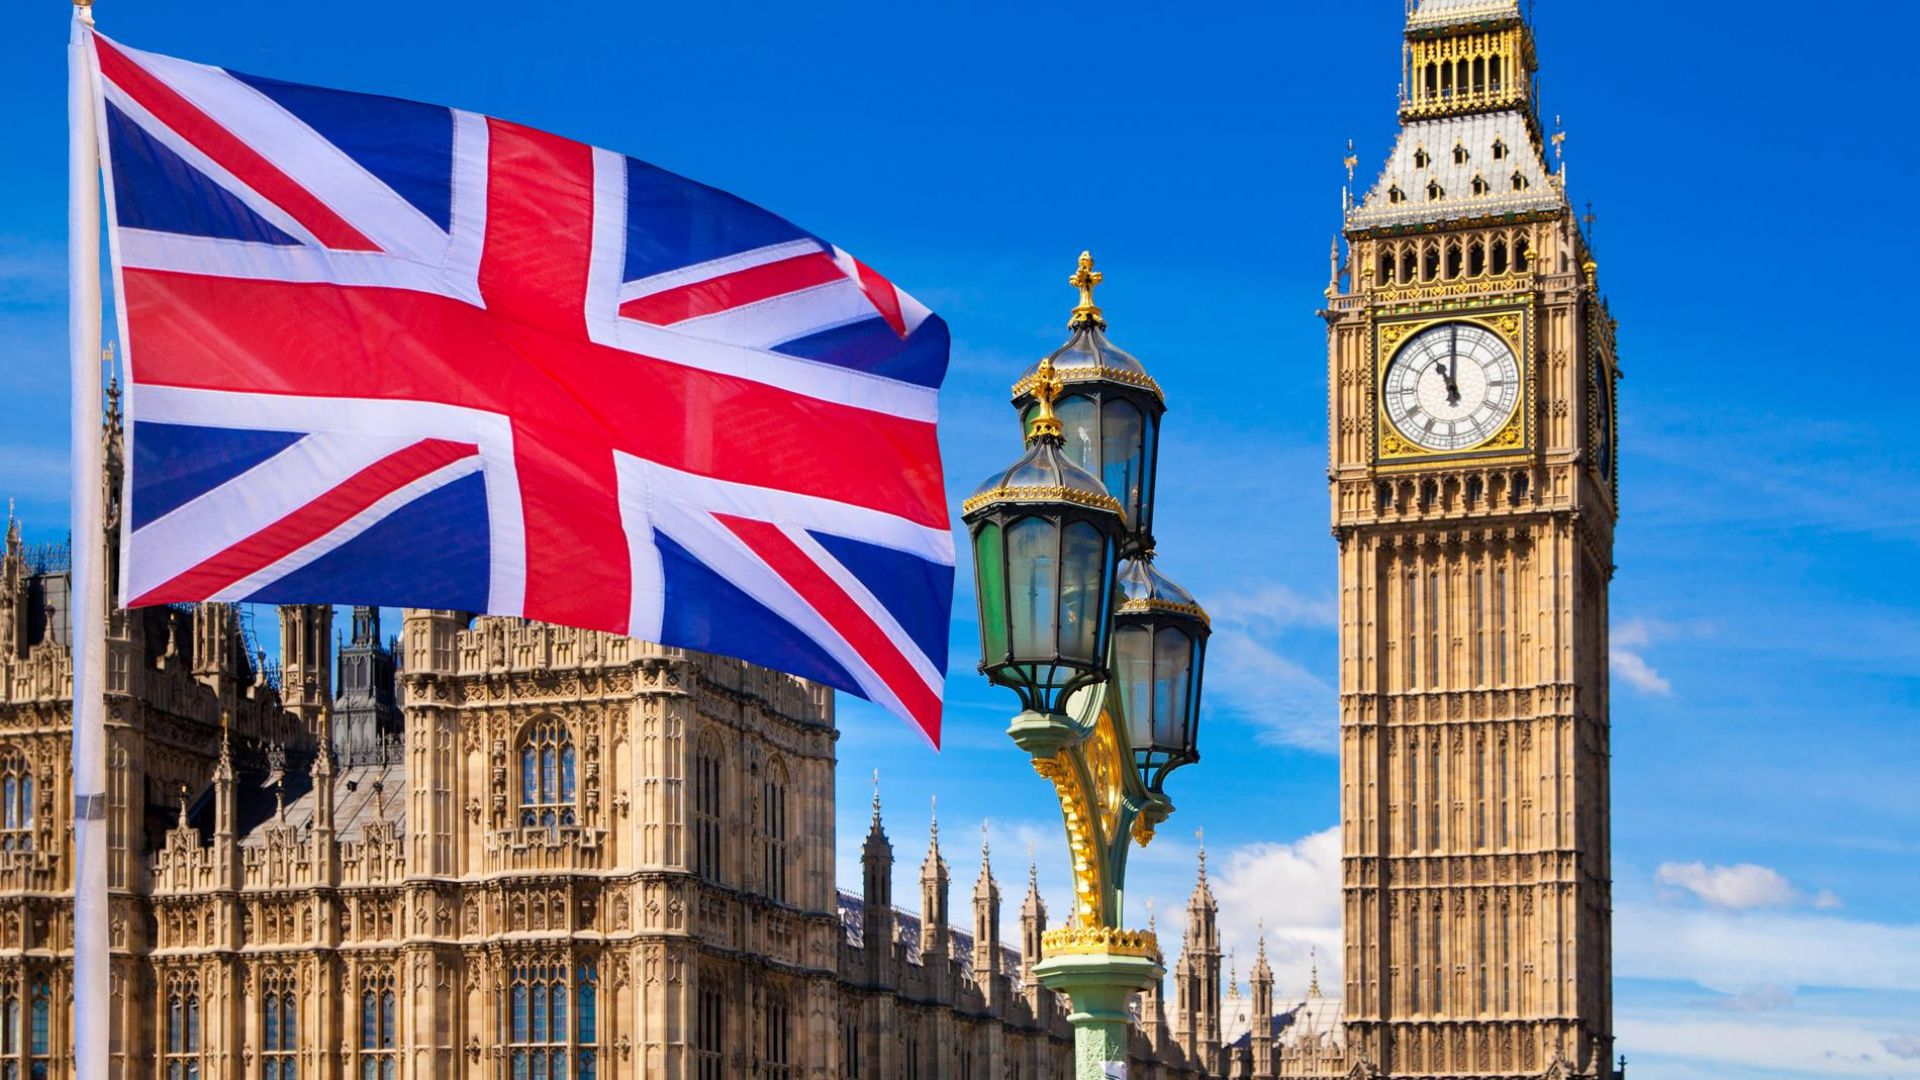 1 трлн. паунда напускат Великобритания заради Брекзит